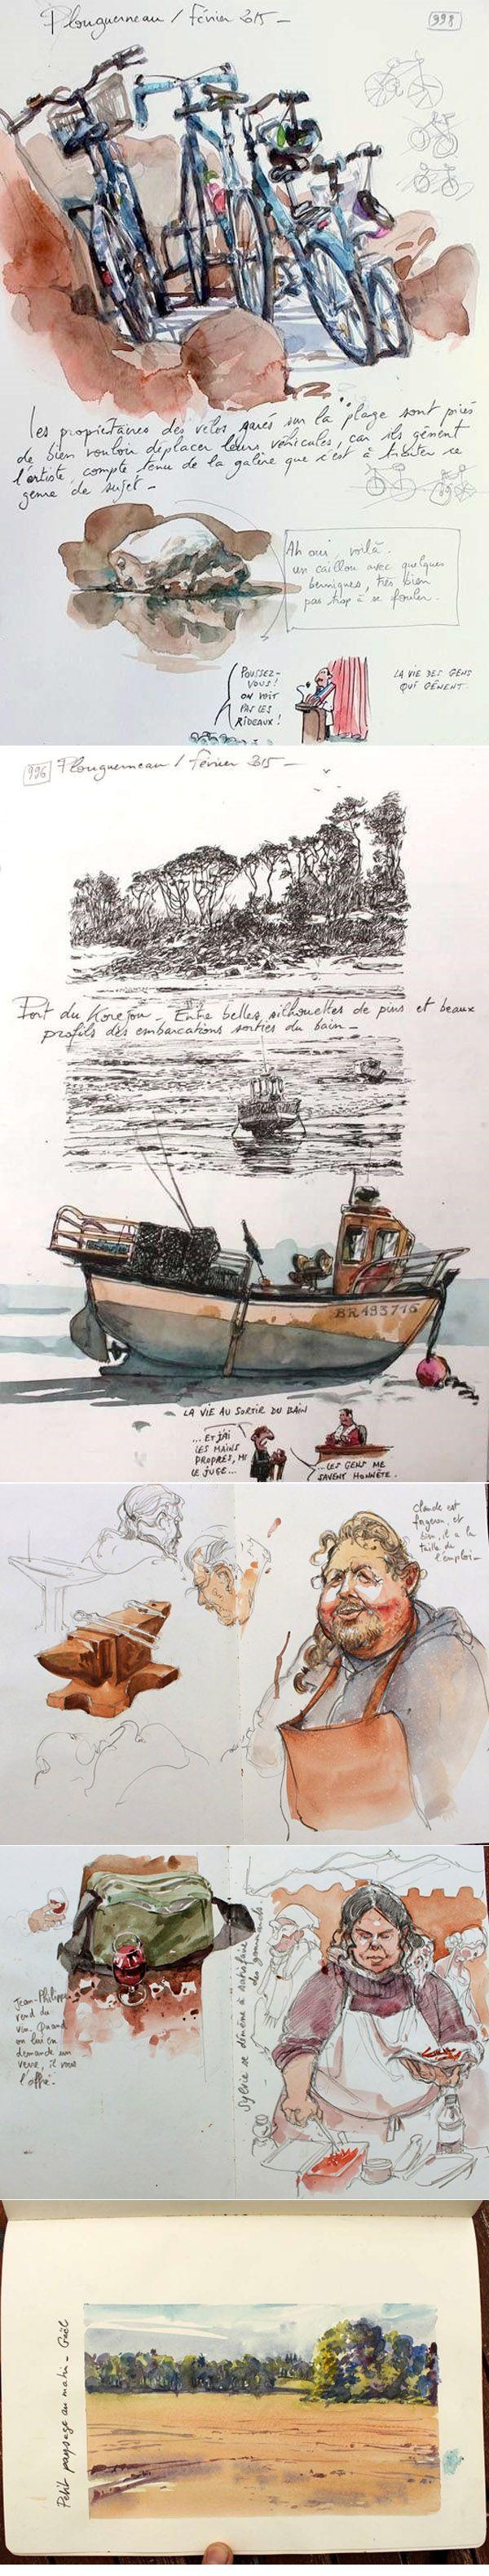 Yann Lesacher  #watercolor  #sketch    http://yal.over-blog.com/page/1